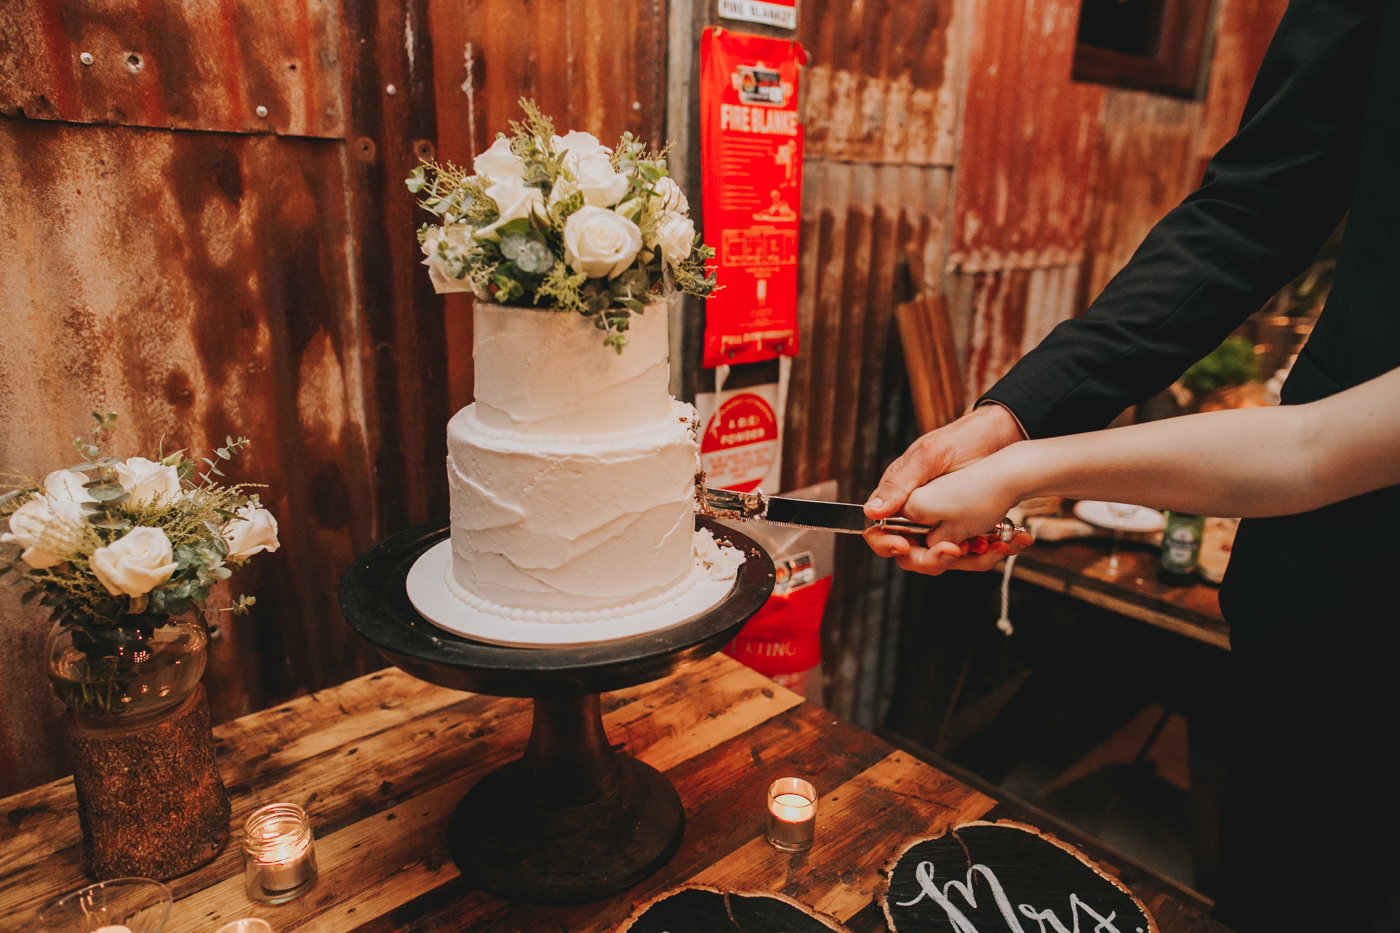 Rachel & Jacob - Willow Farm Berry - South Coast Wedding - Samantha Heather Photography-210.jpg